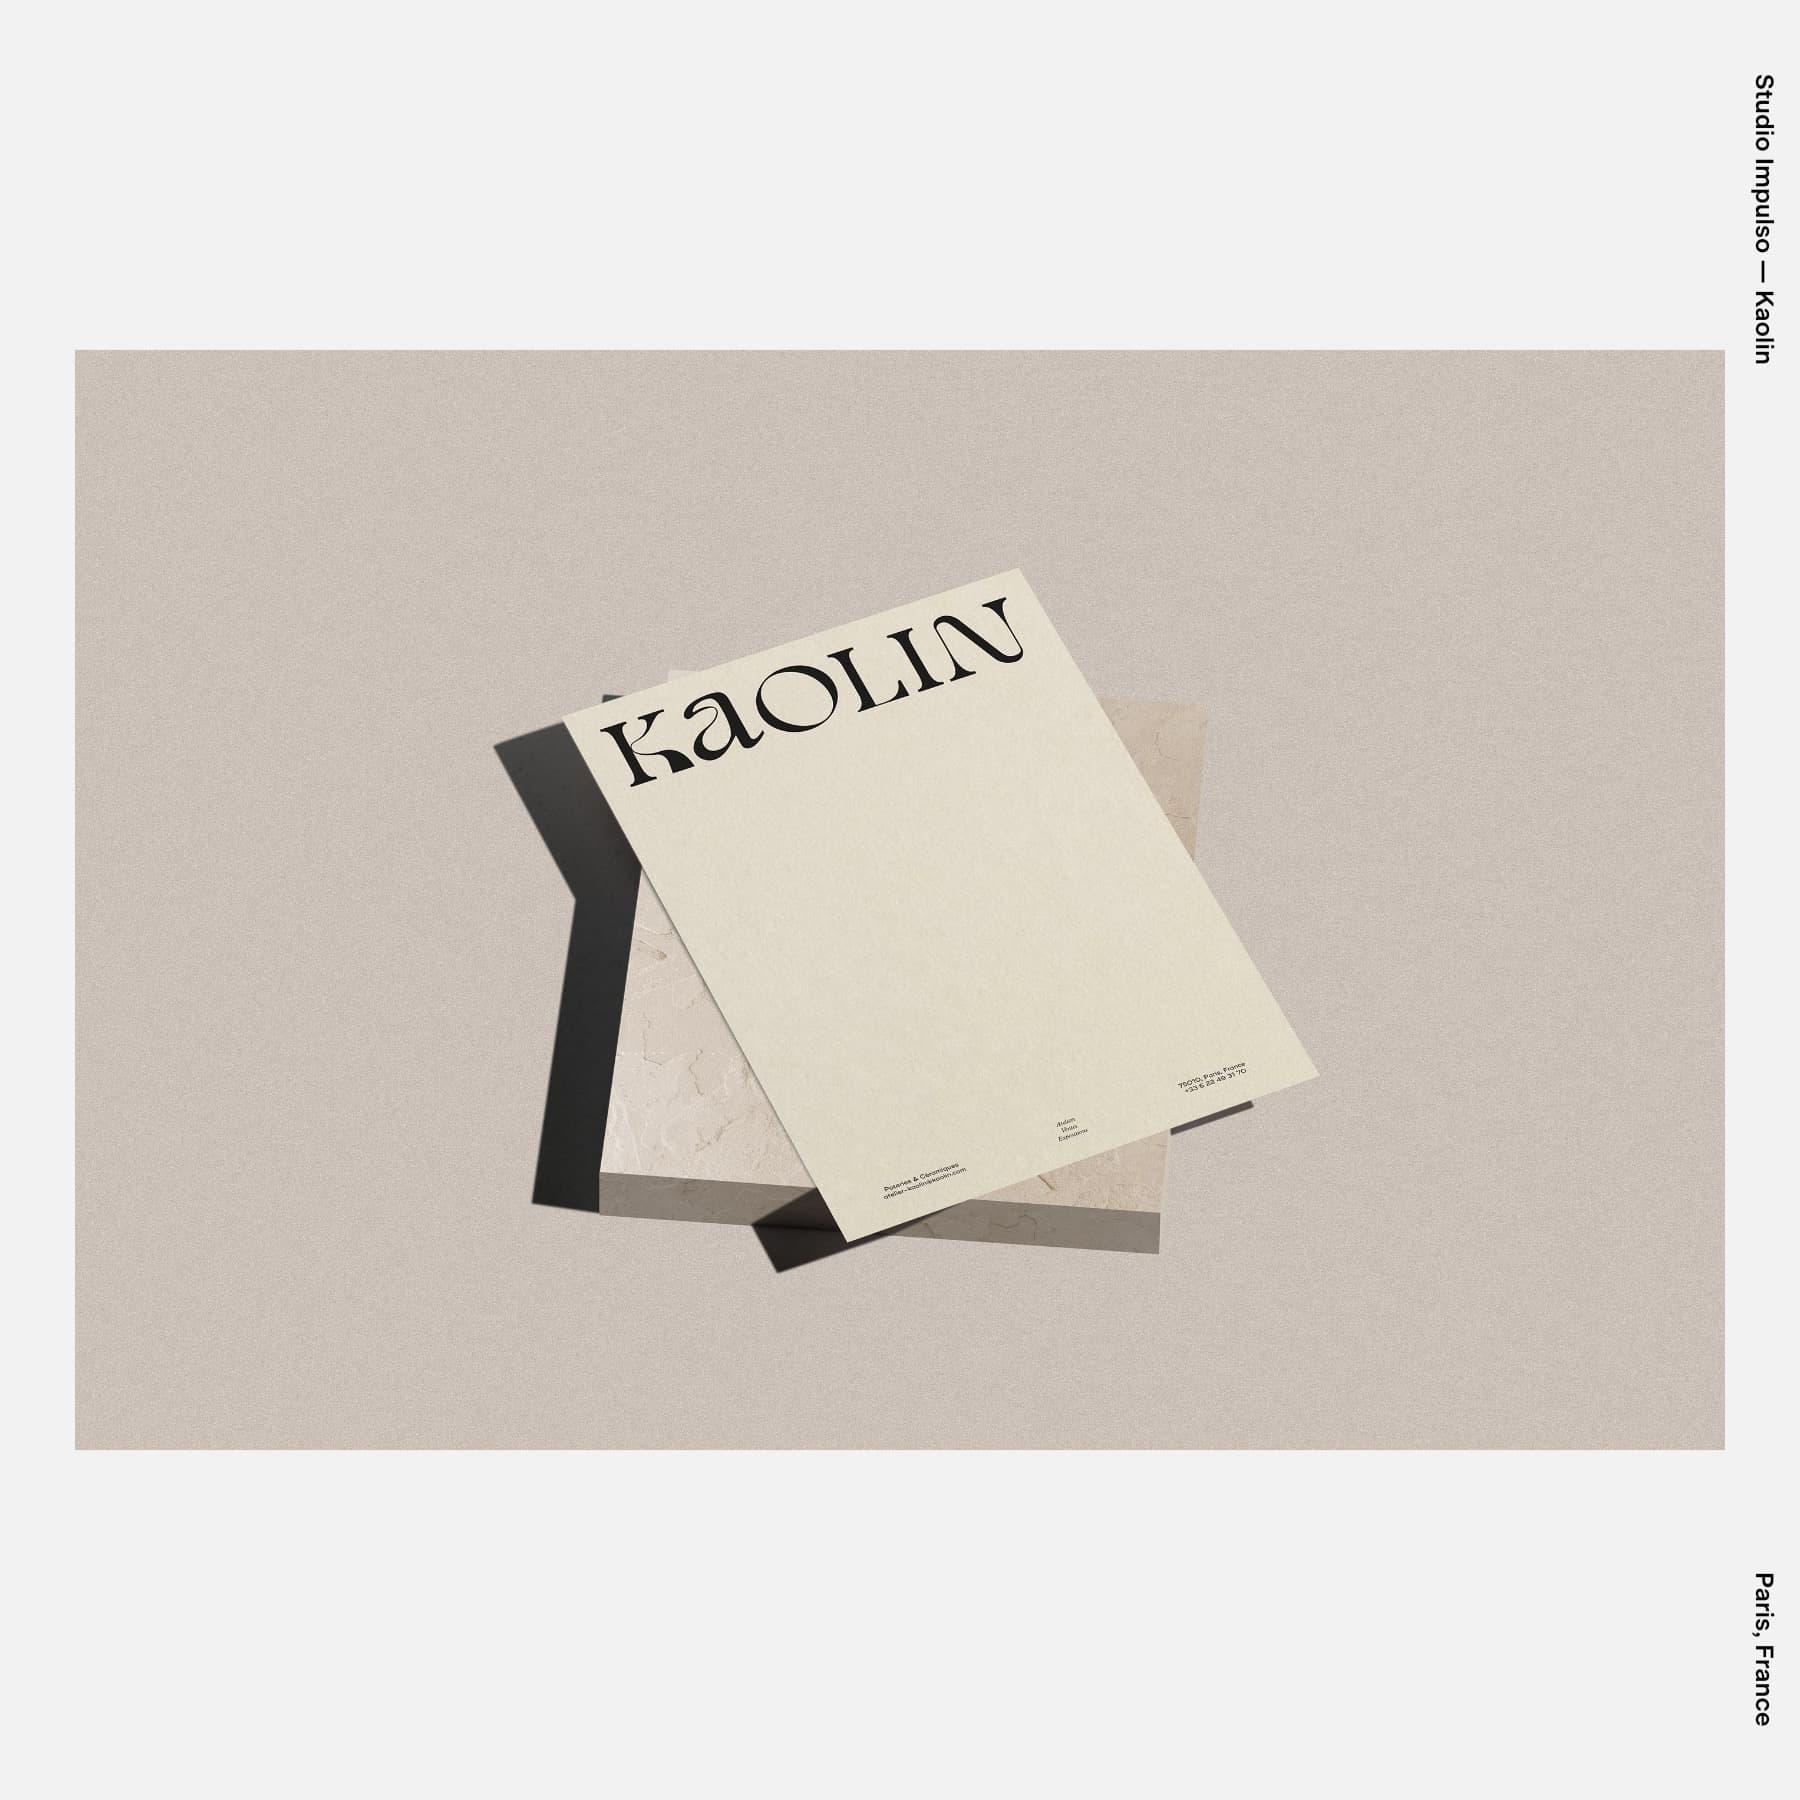 Studio Impulso — Kaolin